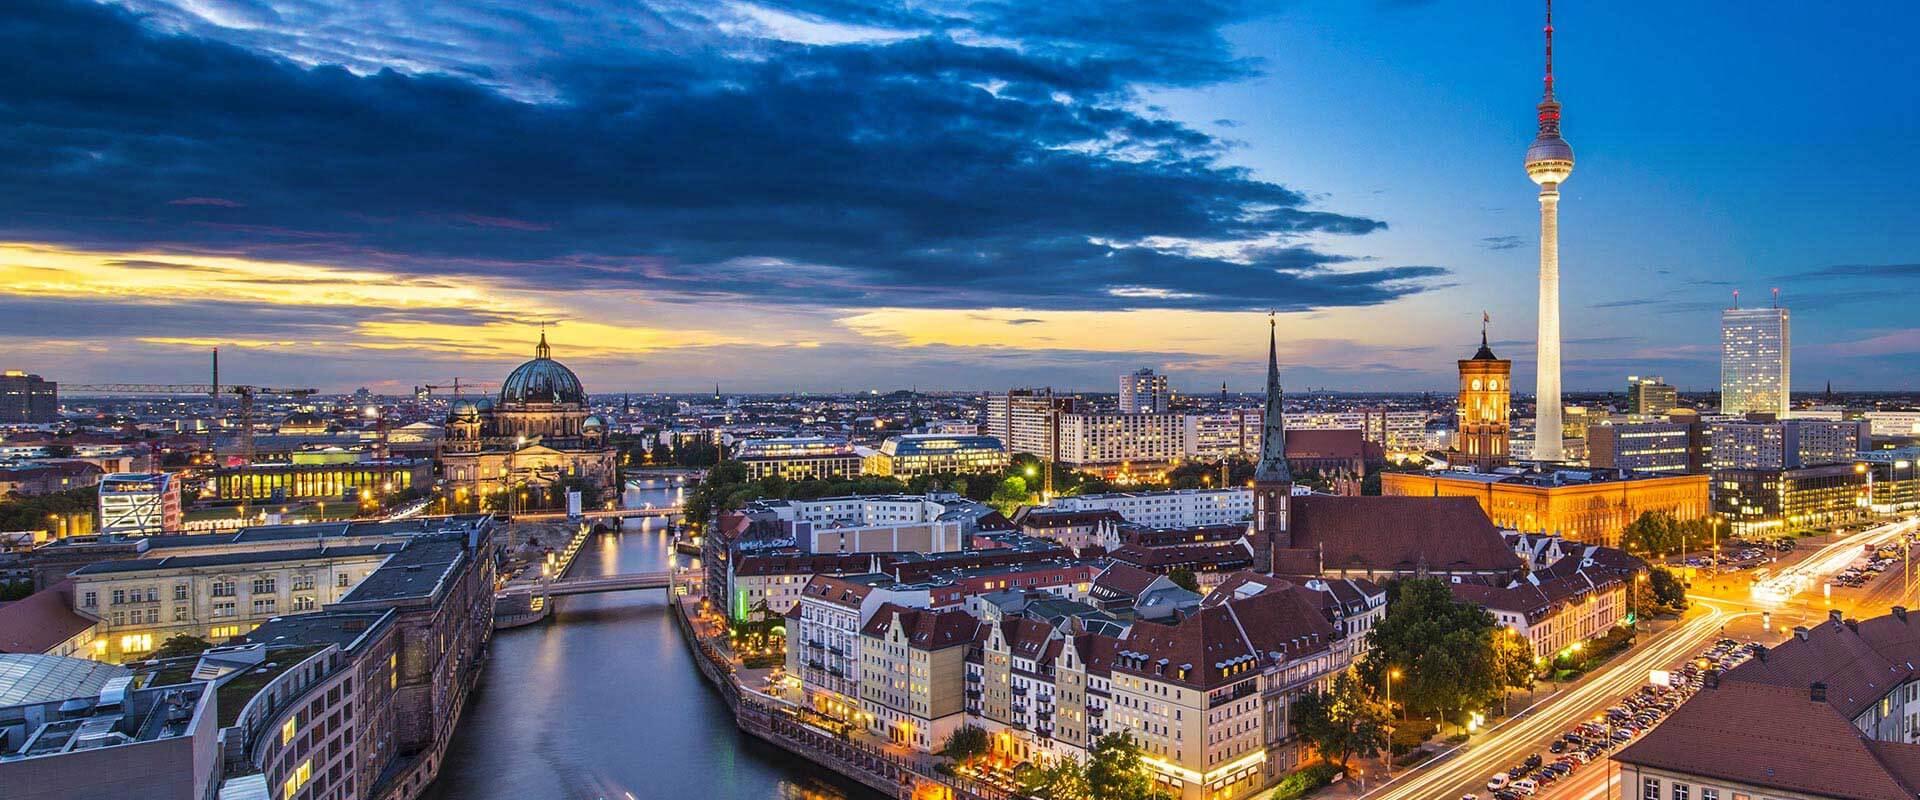 aller-a-berlin-quand-on-est-celibataire